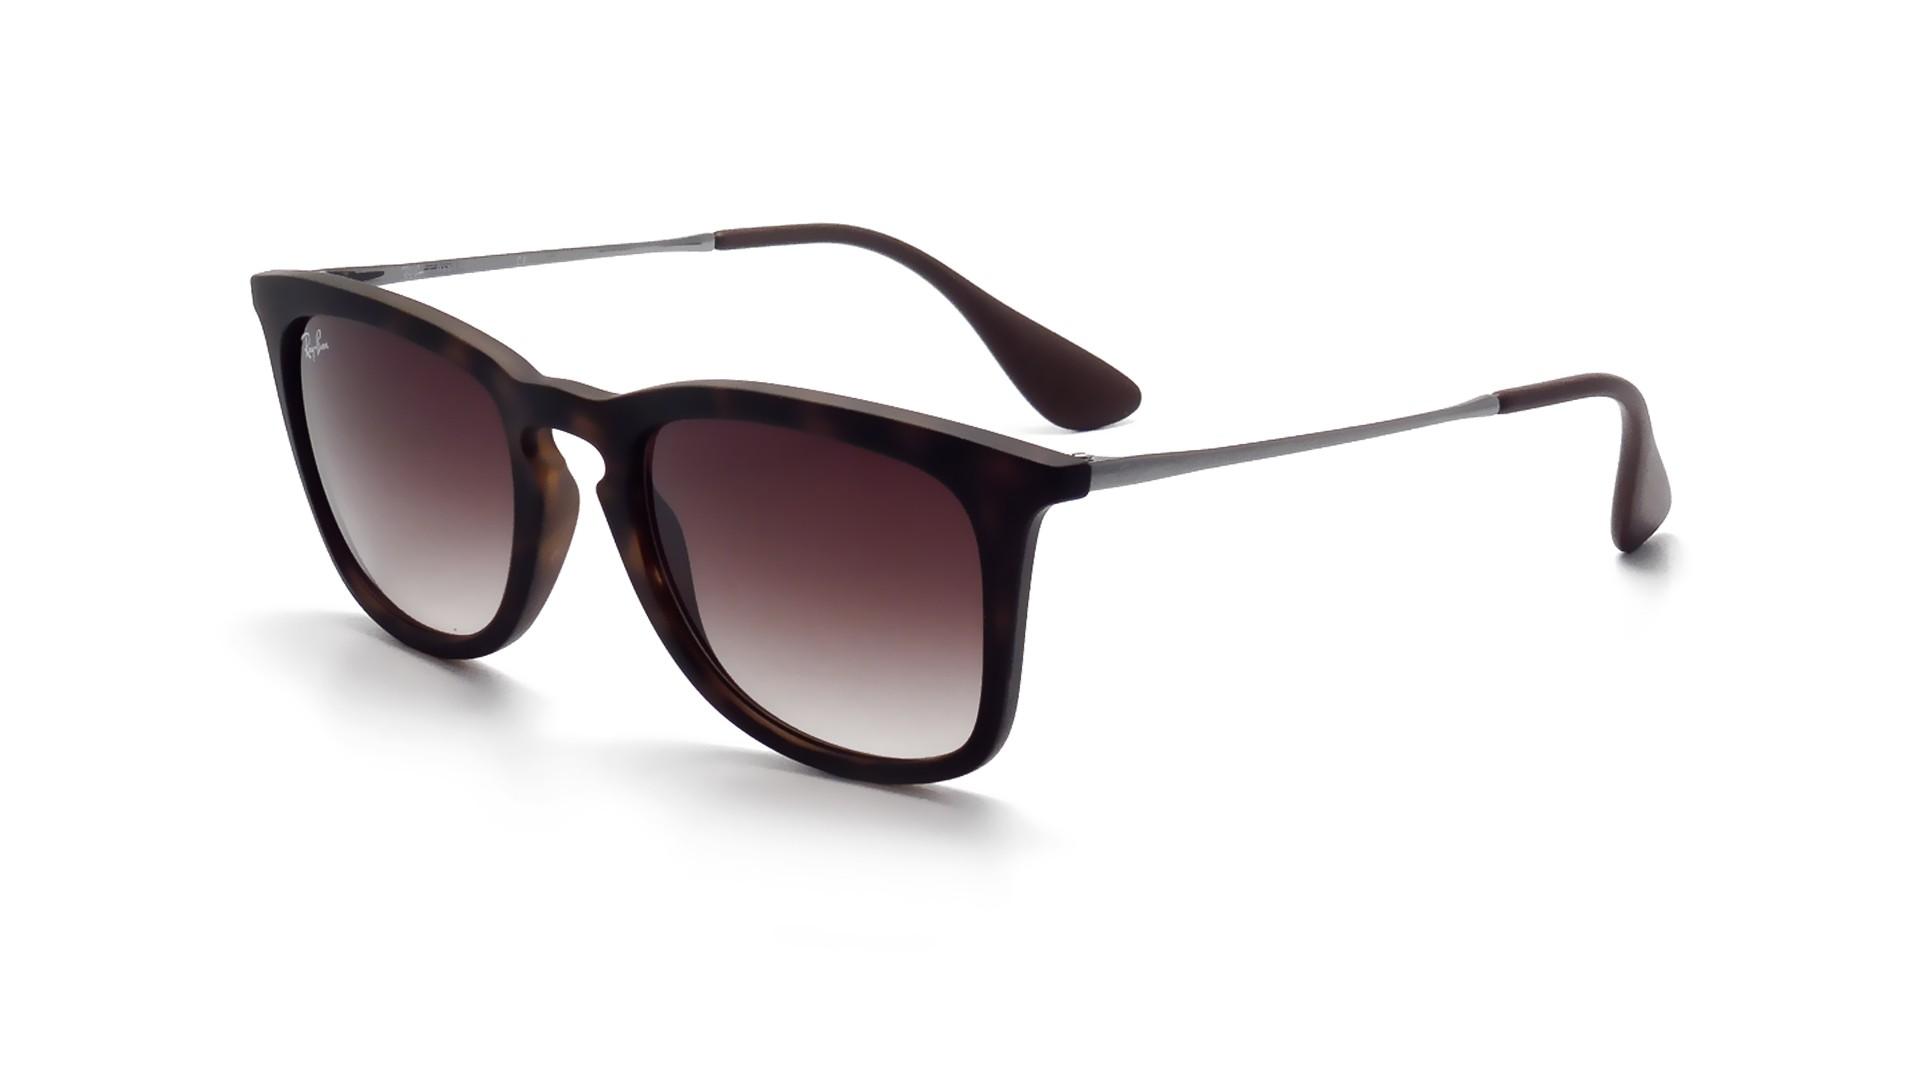 ac2b7d71c41 Sunglasses Ray-Ban RB4221 865 13 50-19 Havane Tortoise Medium Gradient